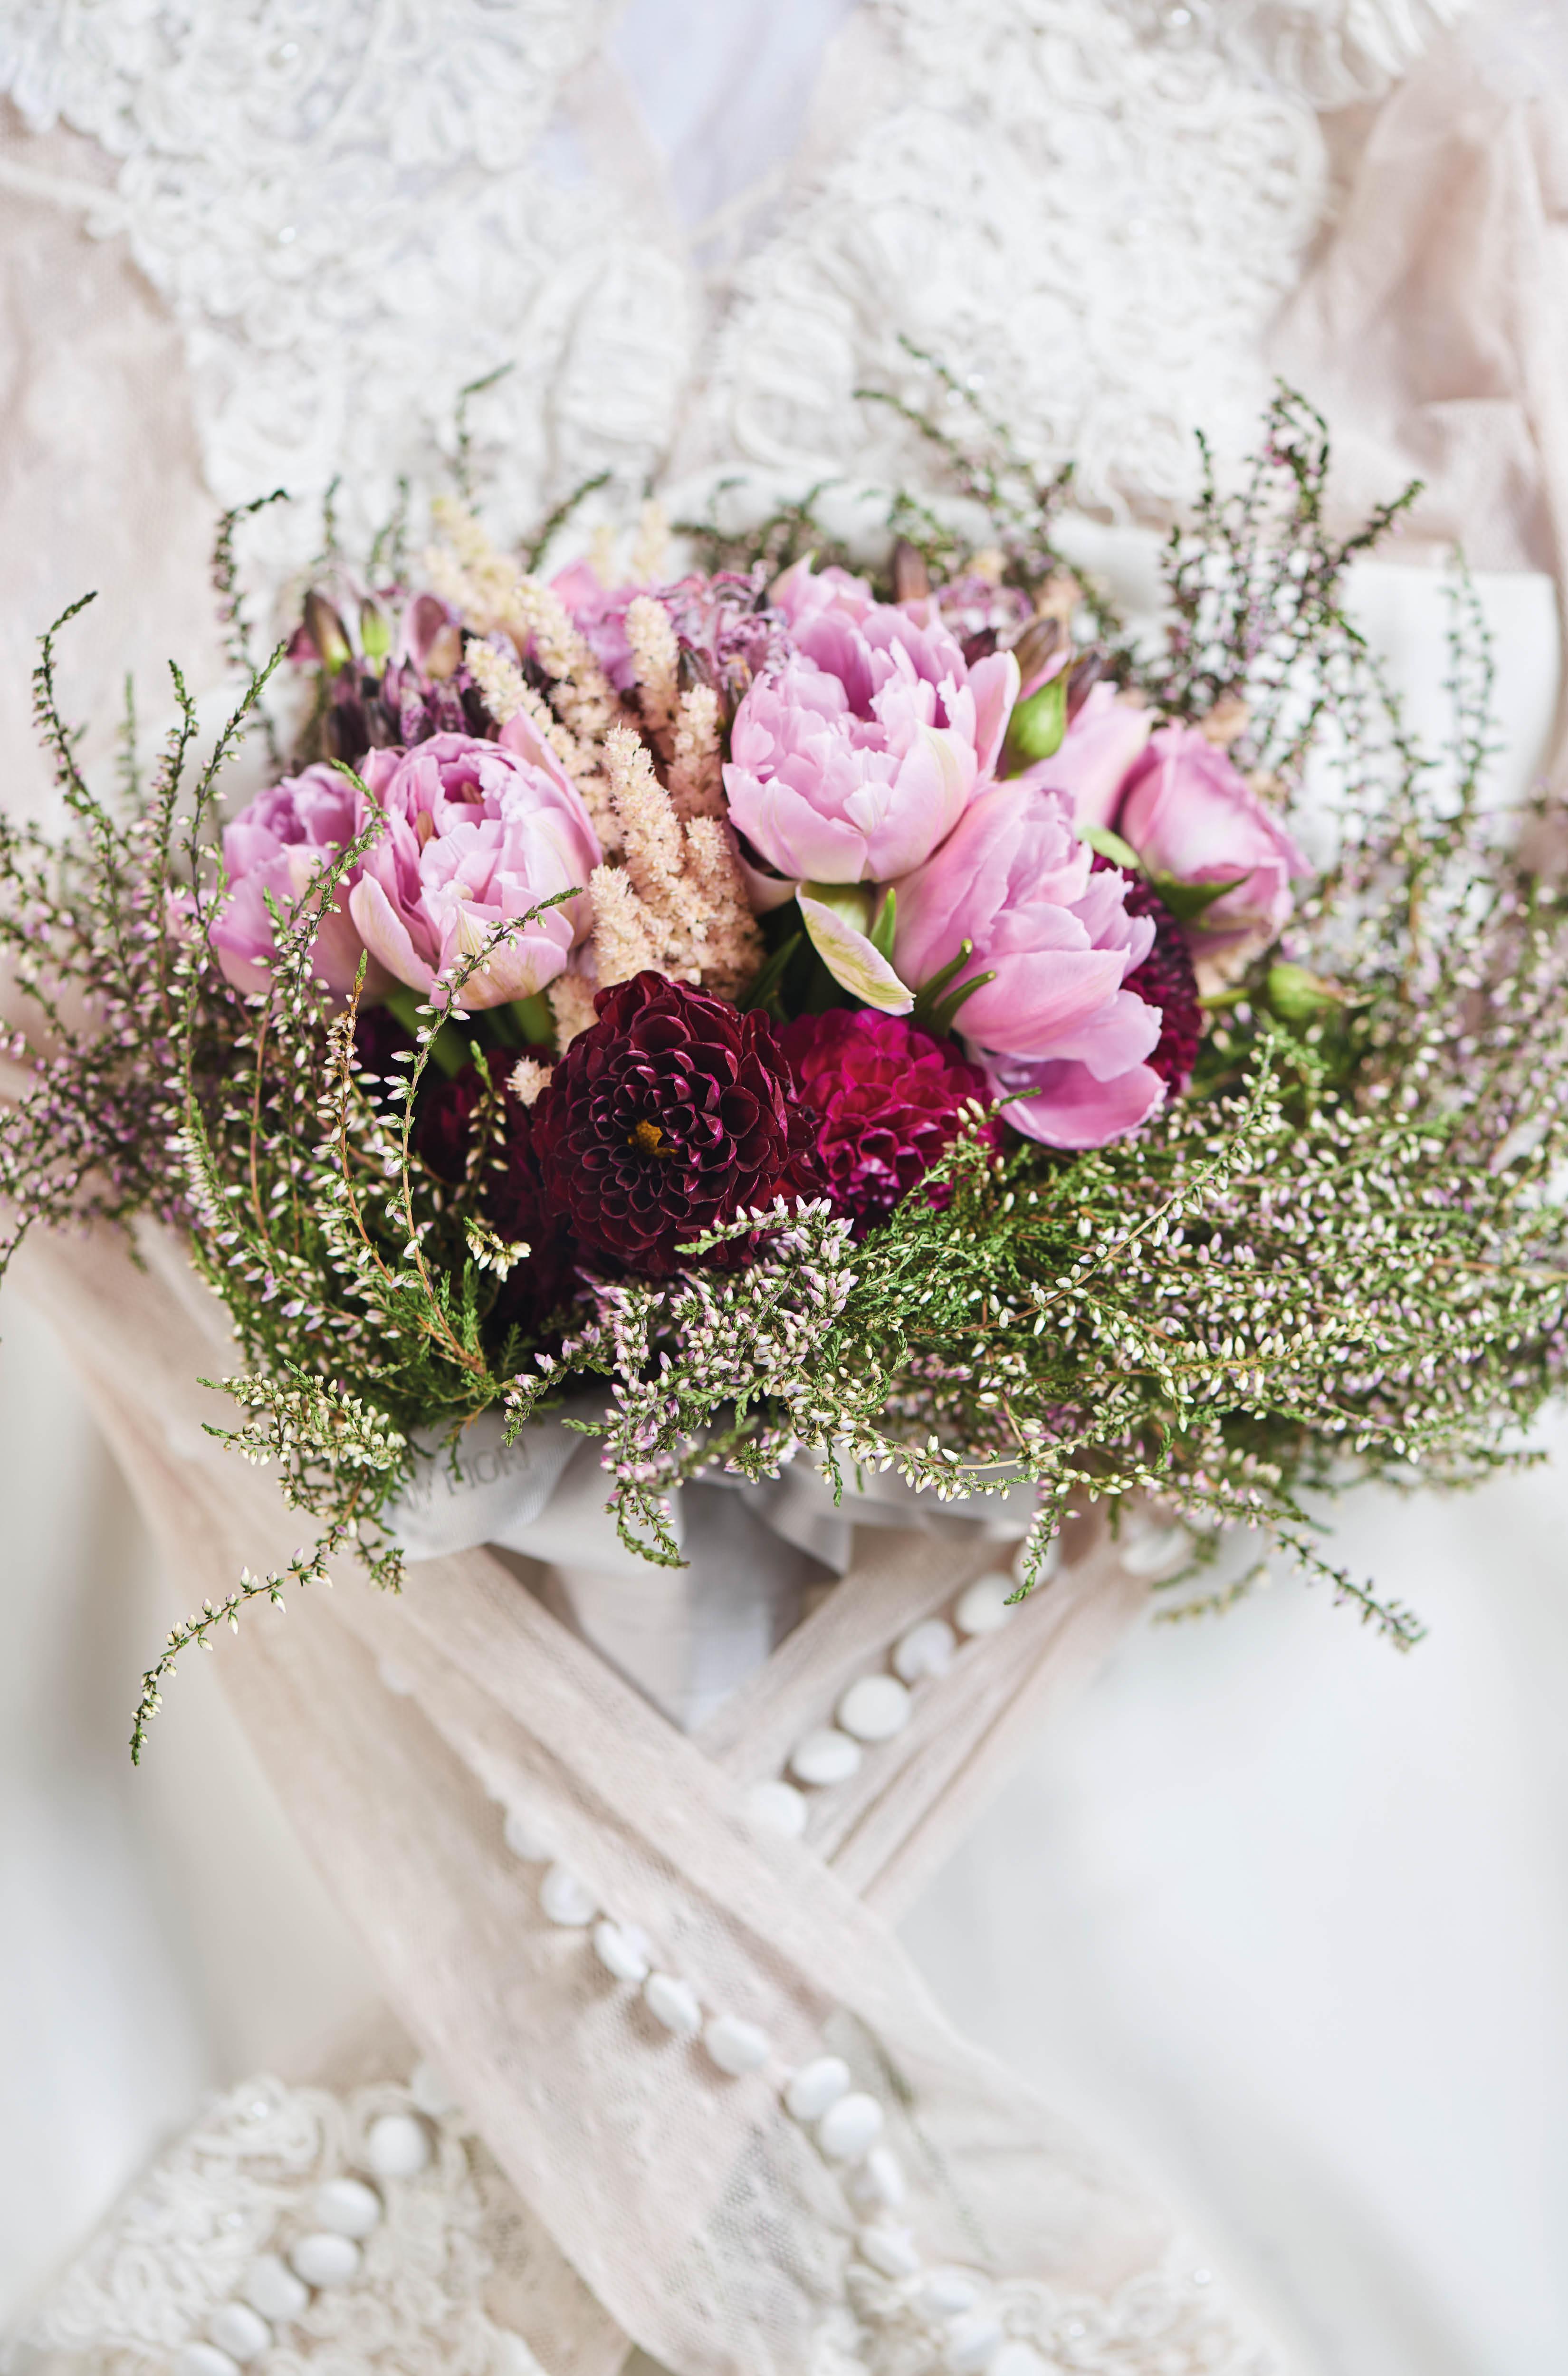 Bouquet of Dutch  tulips and dahlias  by Armani/Fiori;  dress by Rania Hatoum